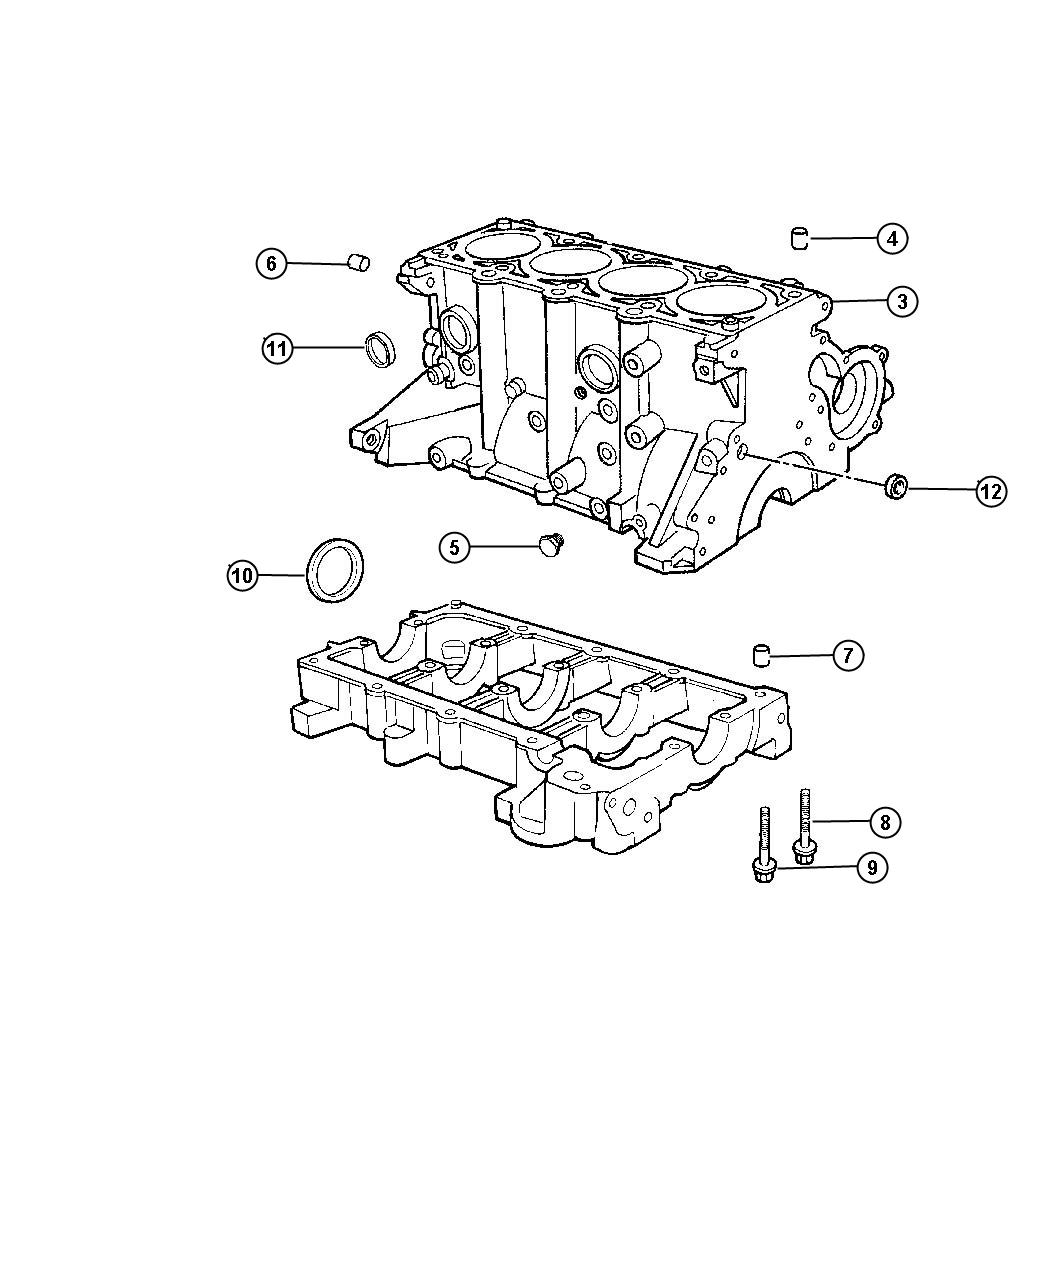 Jeep Liberty Seal Rear Main Crankshaft